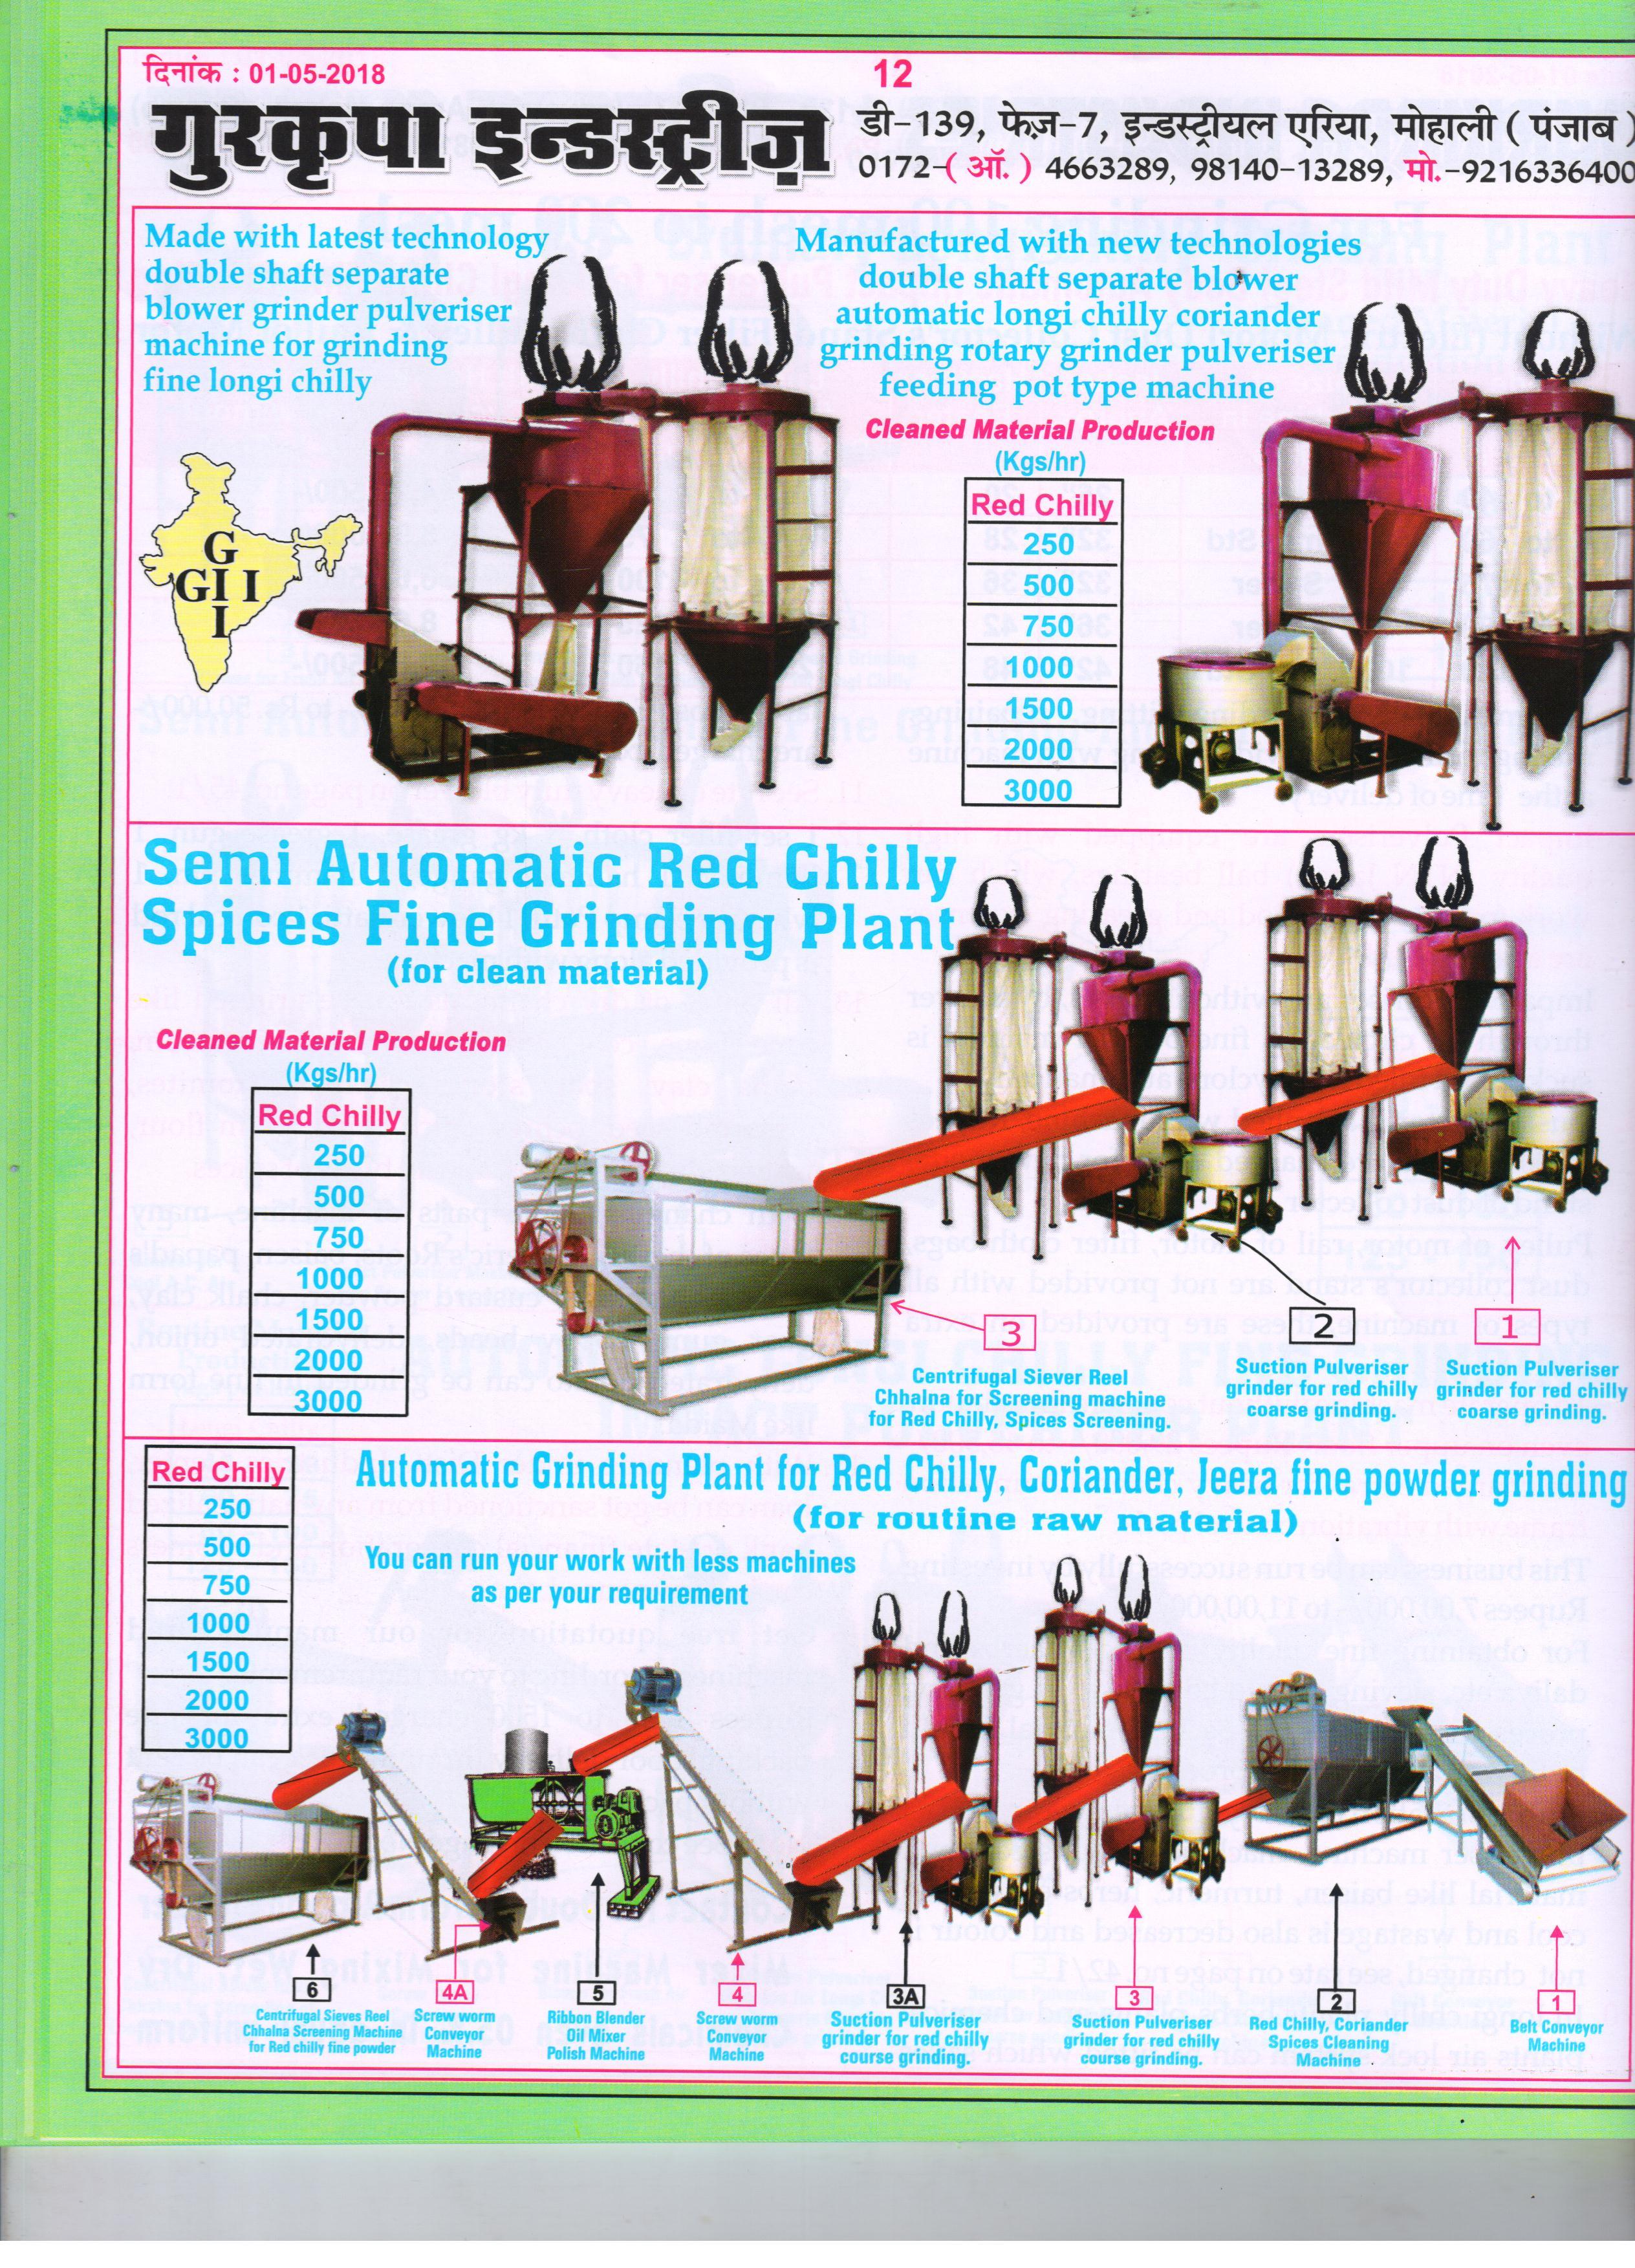 Red Chilli Grinder Pulveriser Manufacturer In Lalitpur By